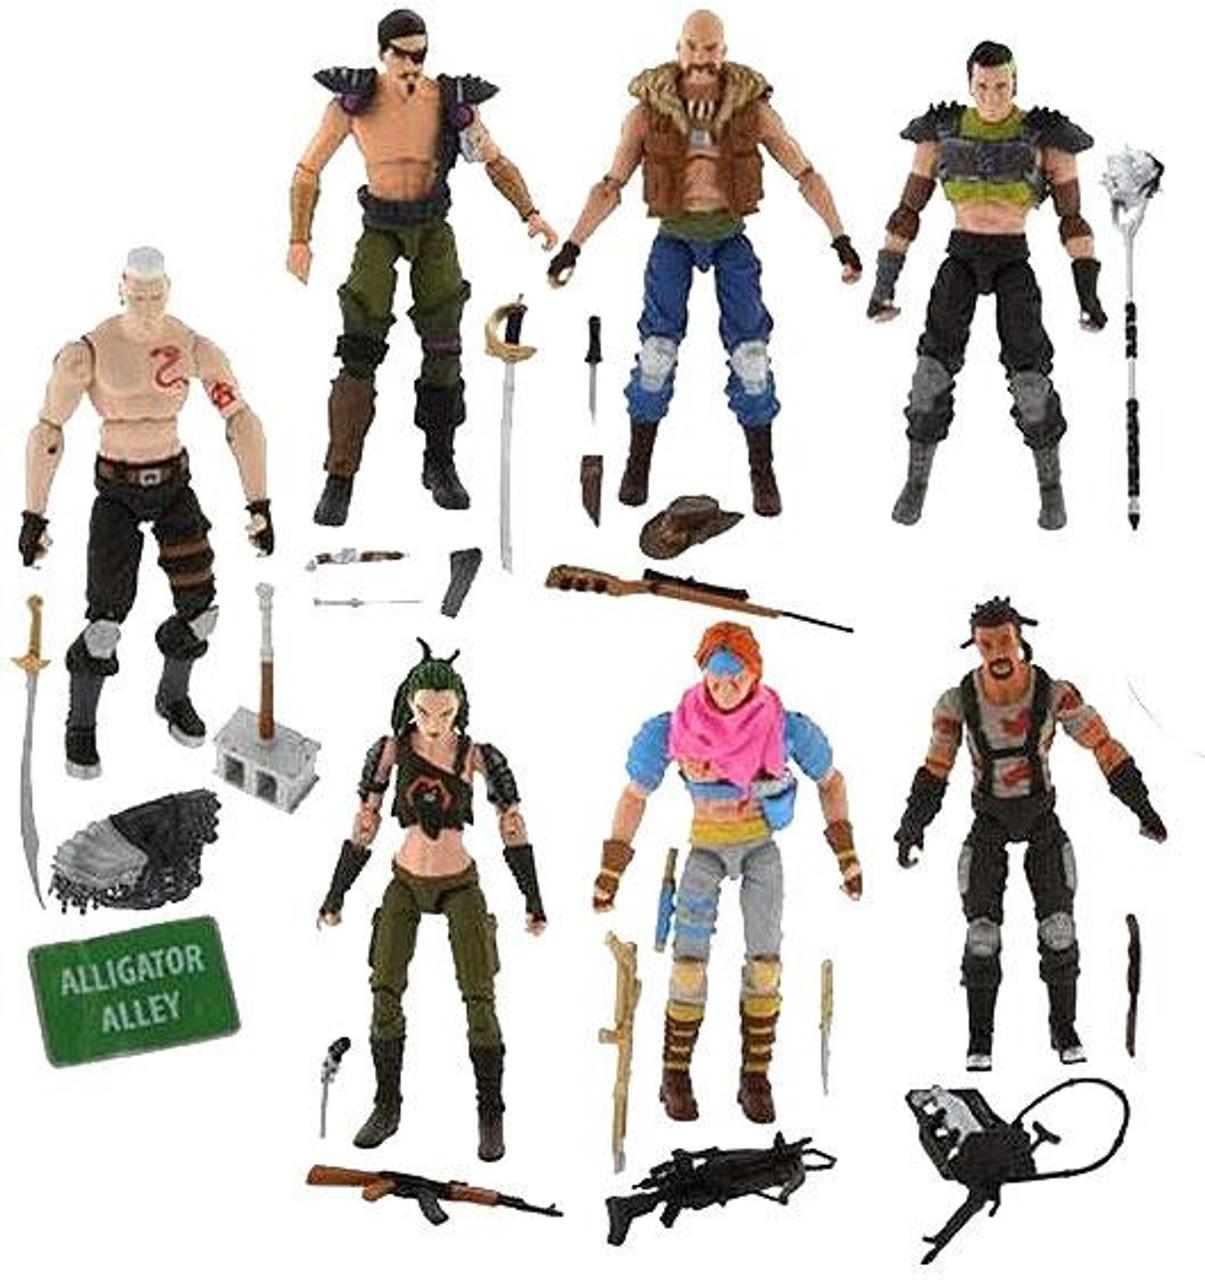 GI Joe Dreadnok's Battle Exclusive Action Figure Set